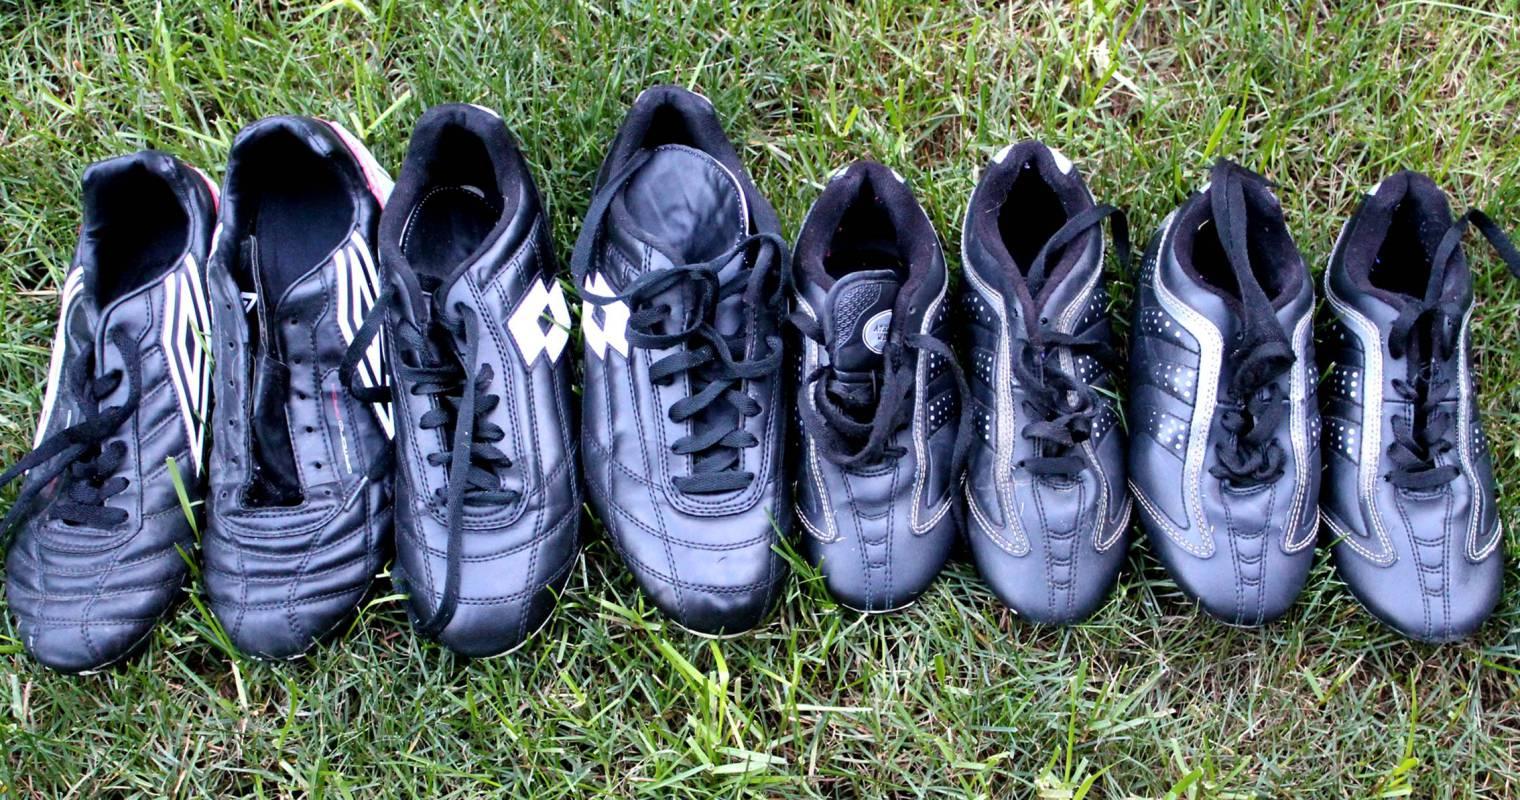 soccershoes2-1